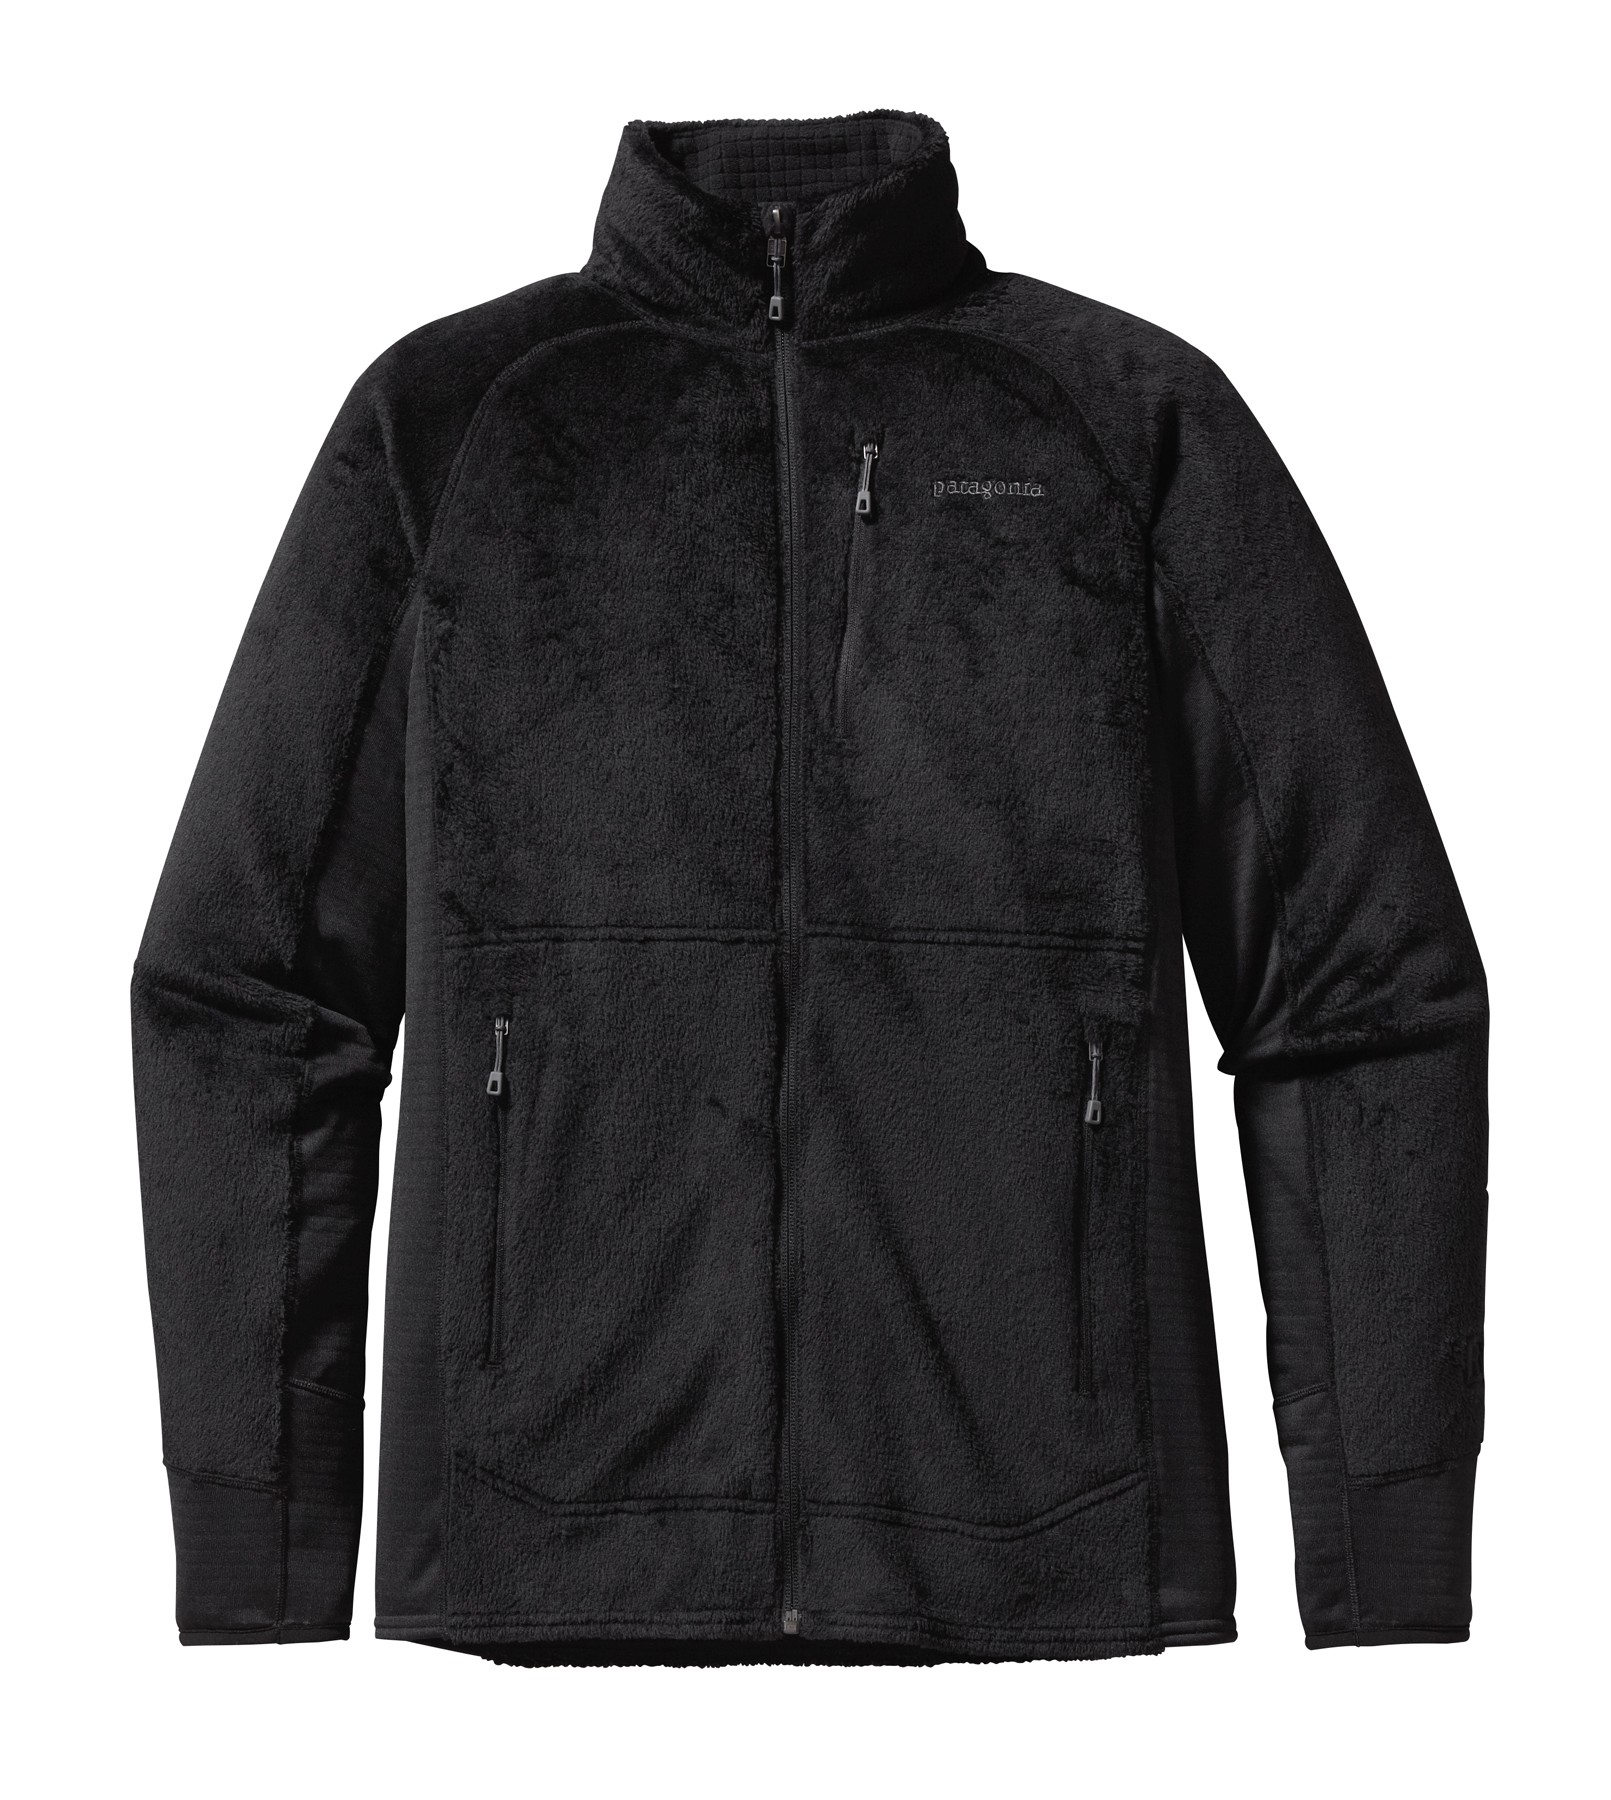 Patagonia Mens R2 Fleece Jacket : Black